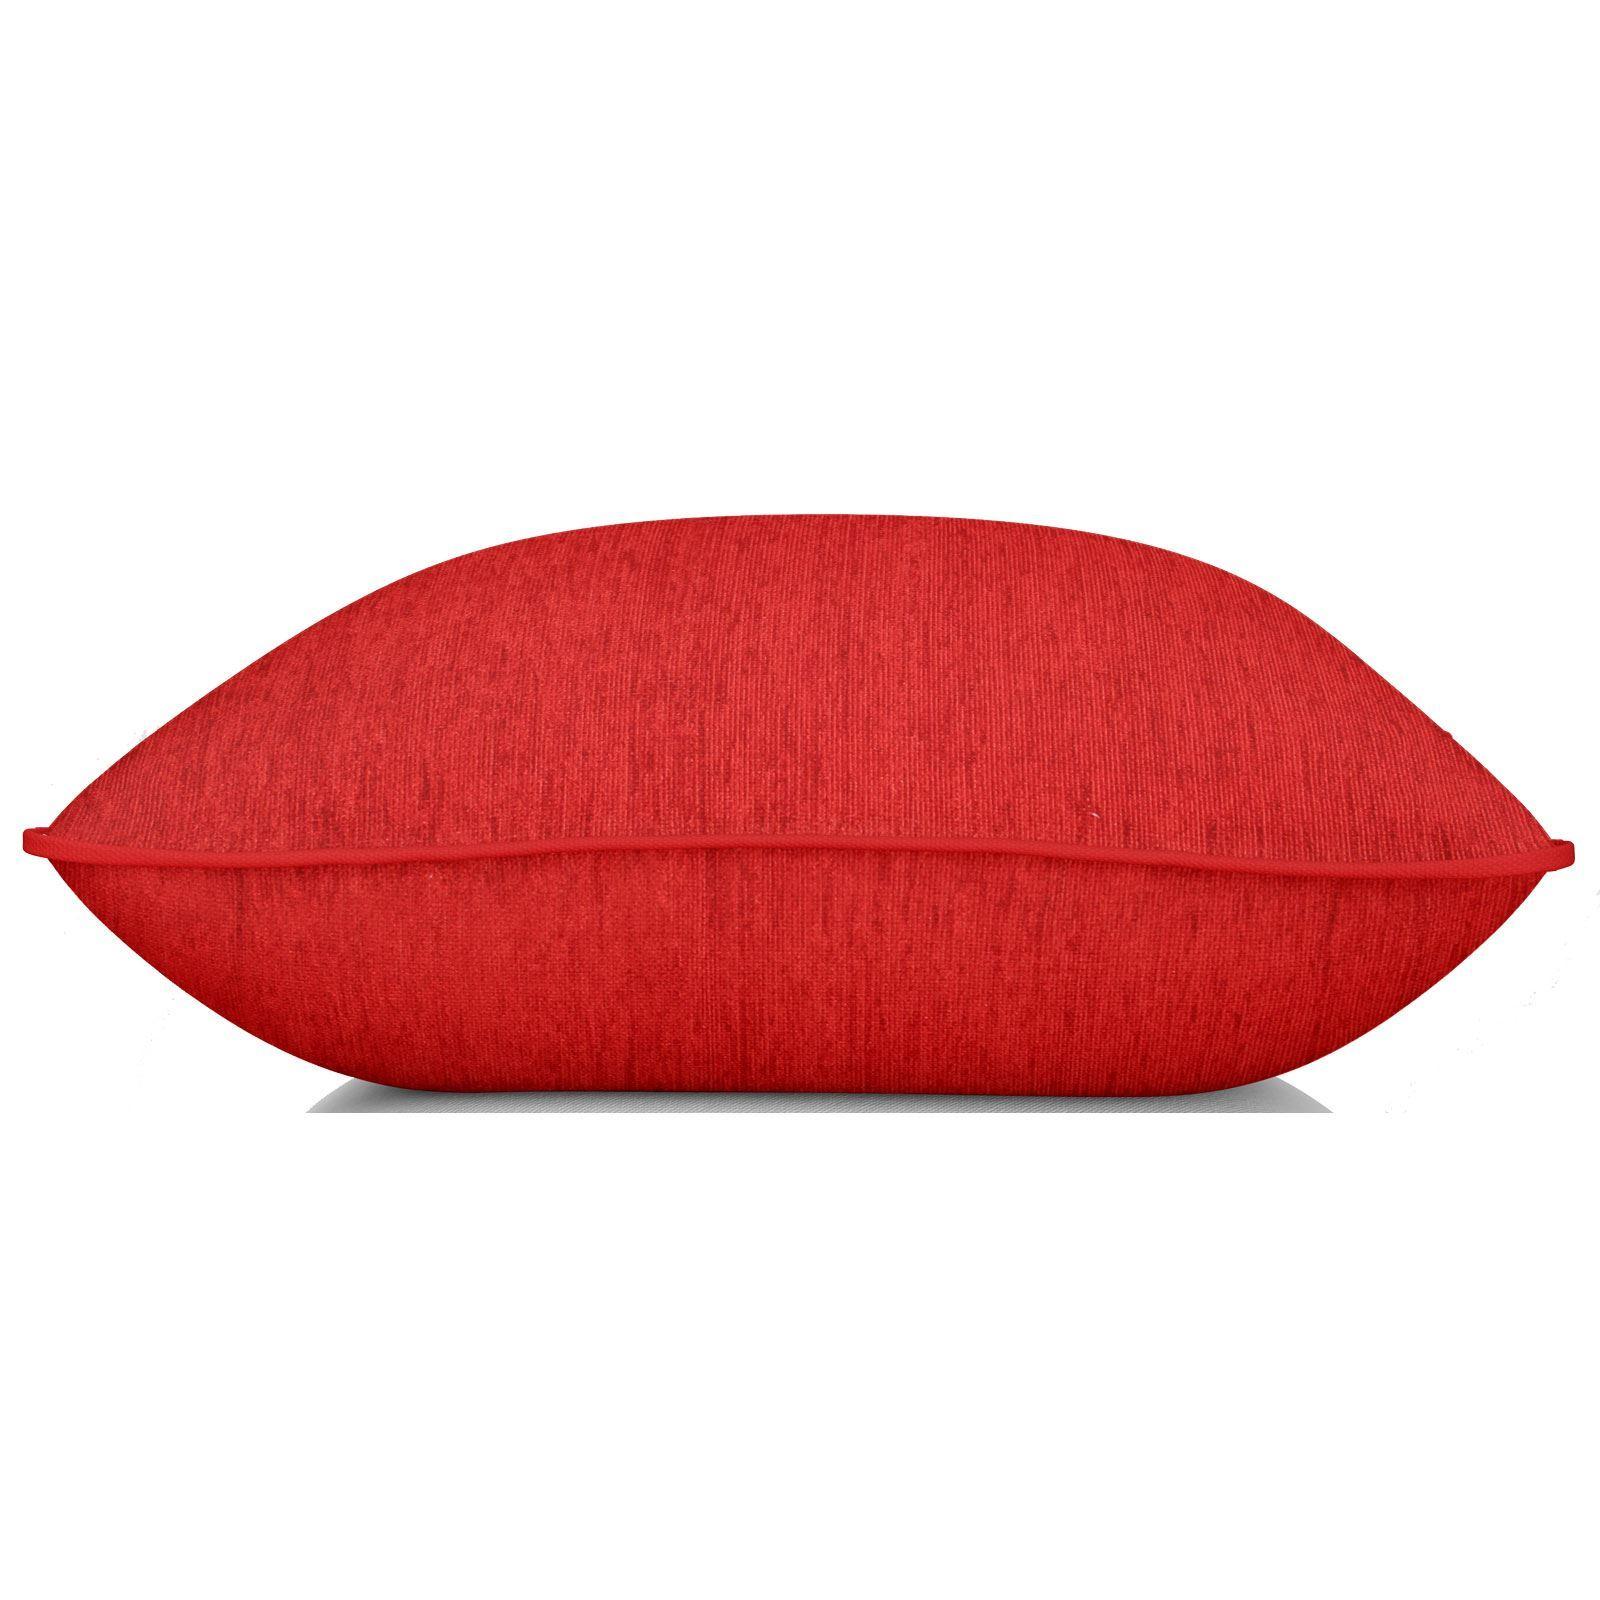 Vino-Tinto-Cushion-Covers-Coleccion-17-034-18-034-43cm-45cm-Cubierta miniatura 3